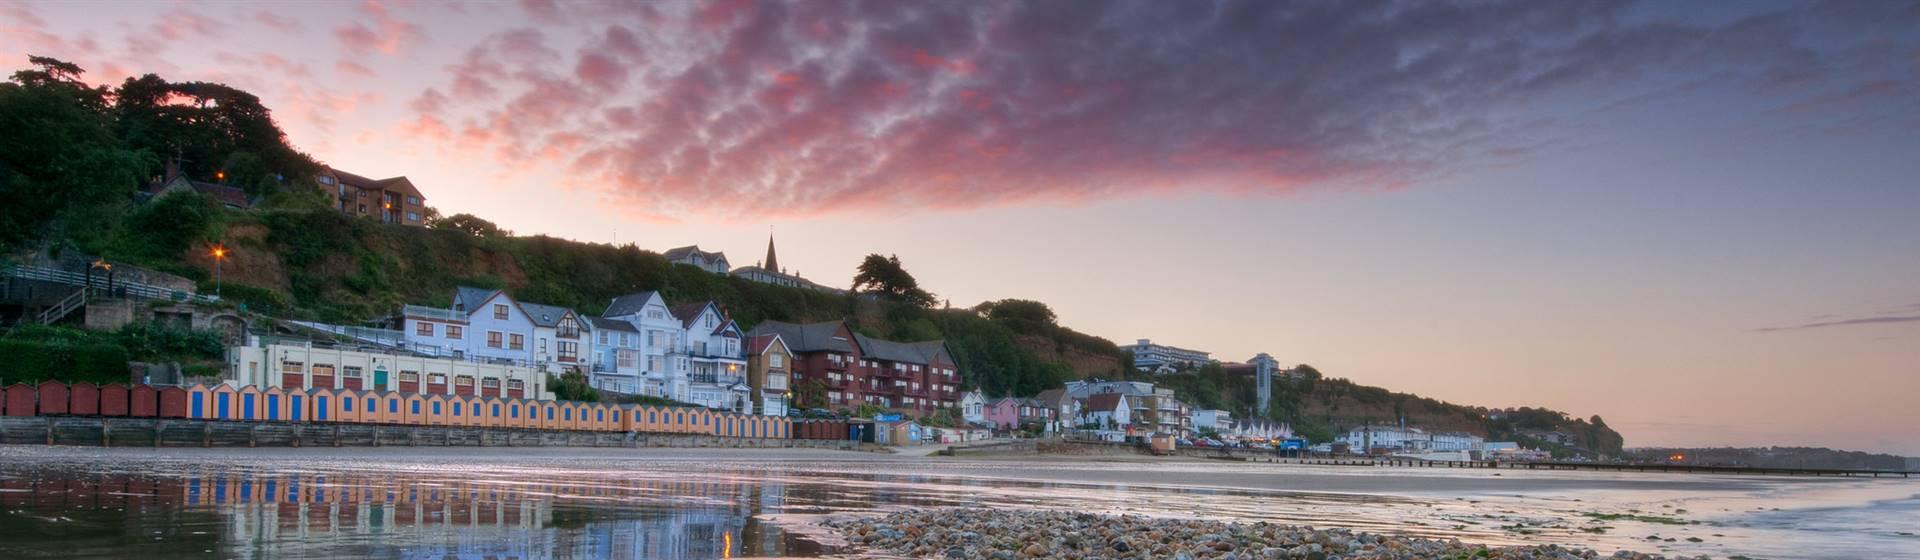 Isle of Wight - Daishs Hotel Shanklin - HPU